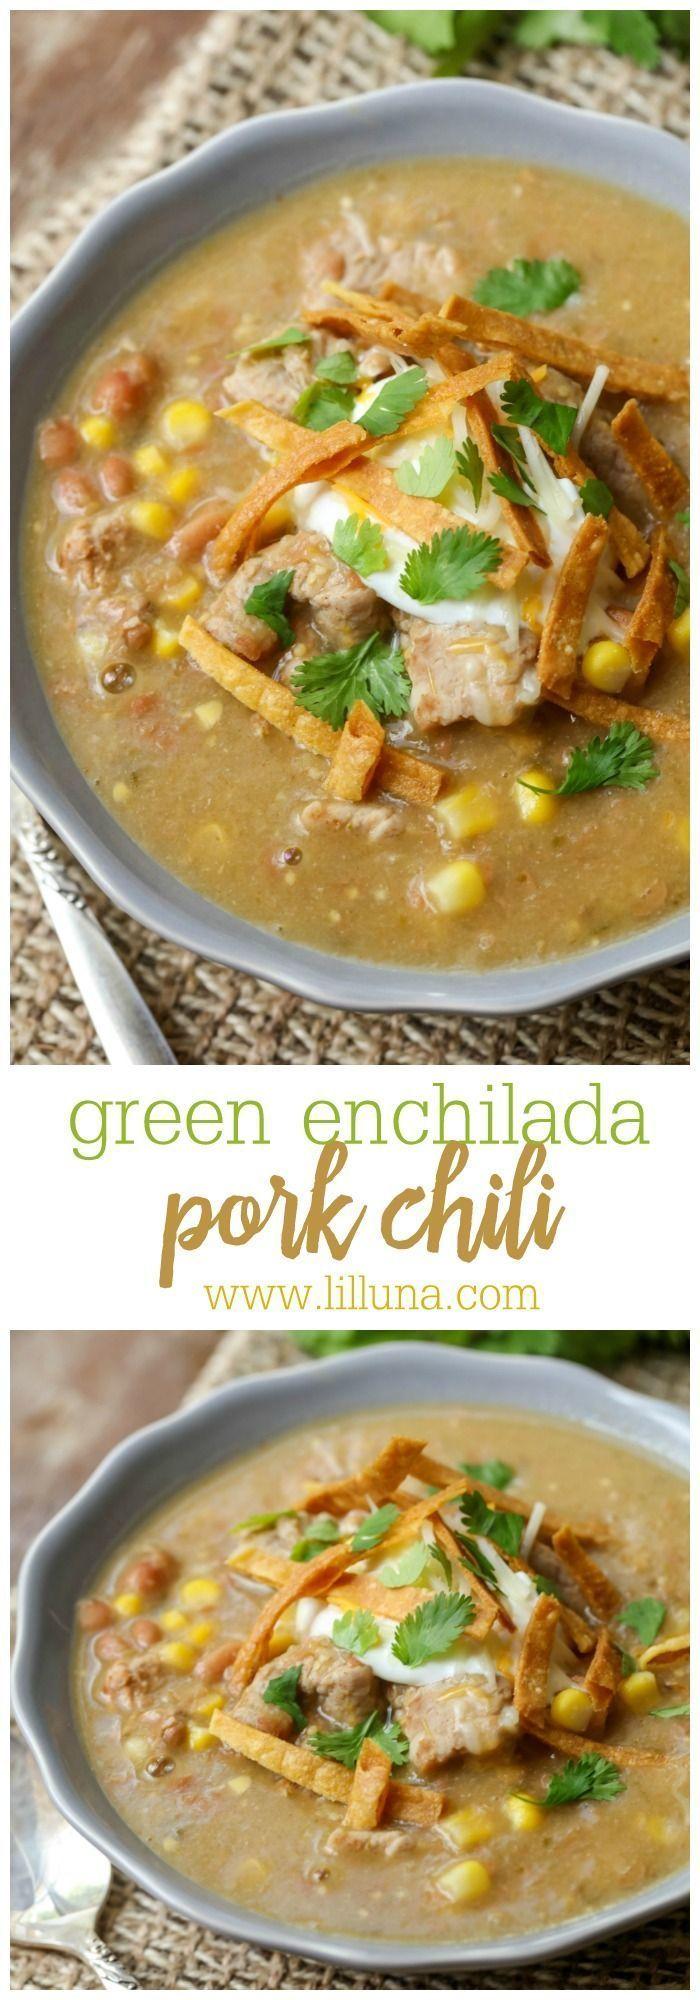 Delicious Green Enchilada Pork Chili filled with beans, corn, pork, broth…